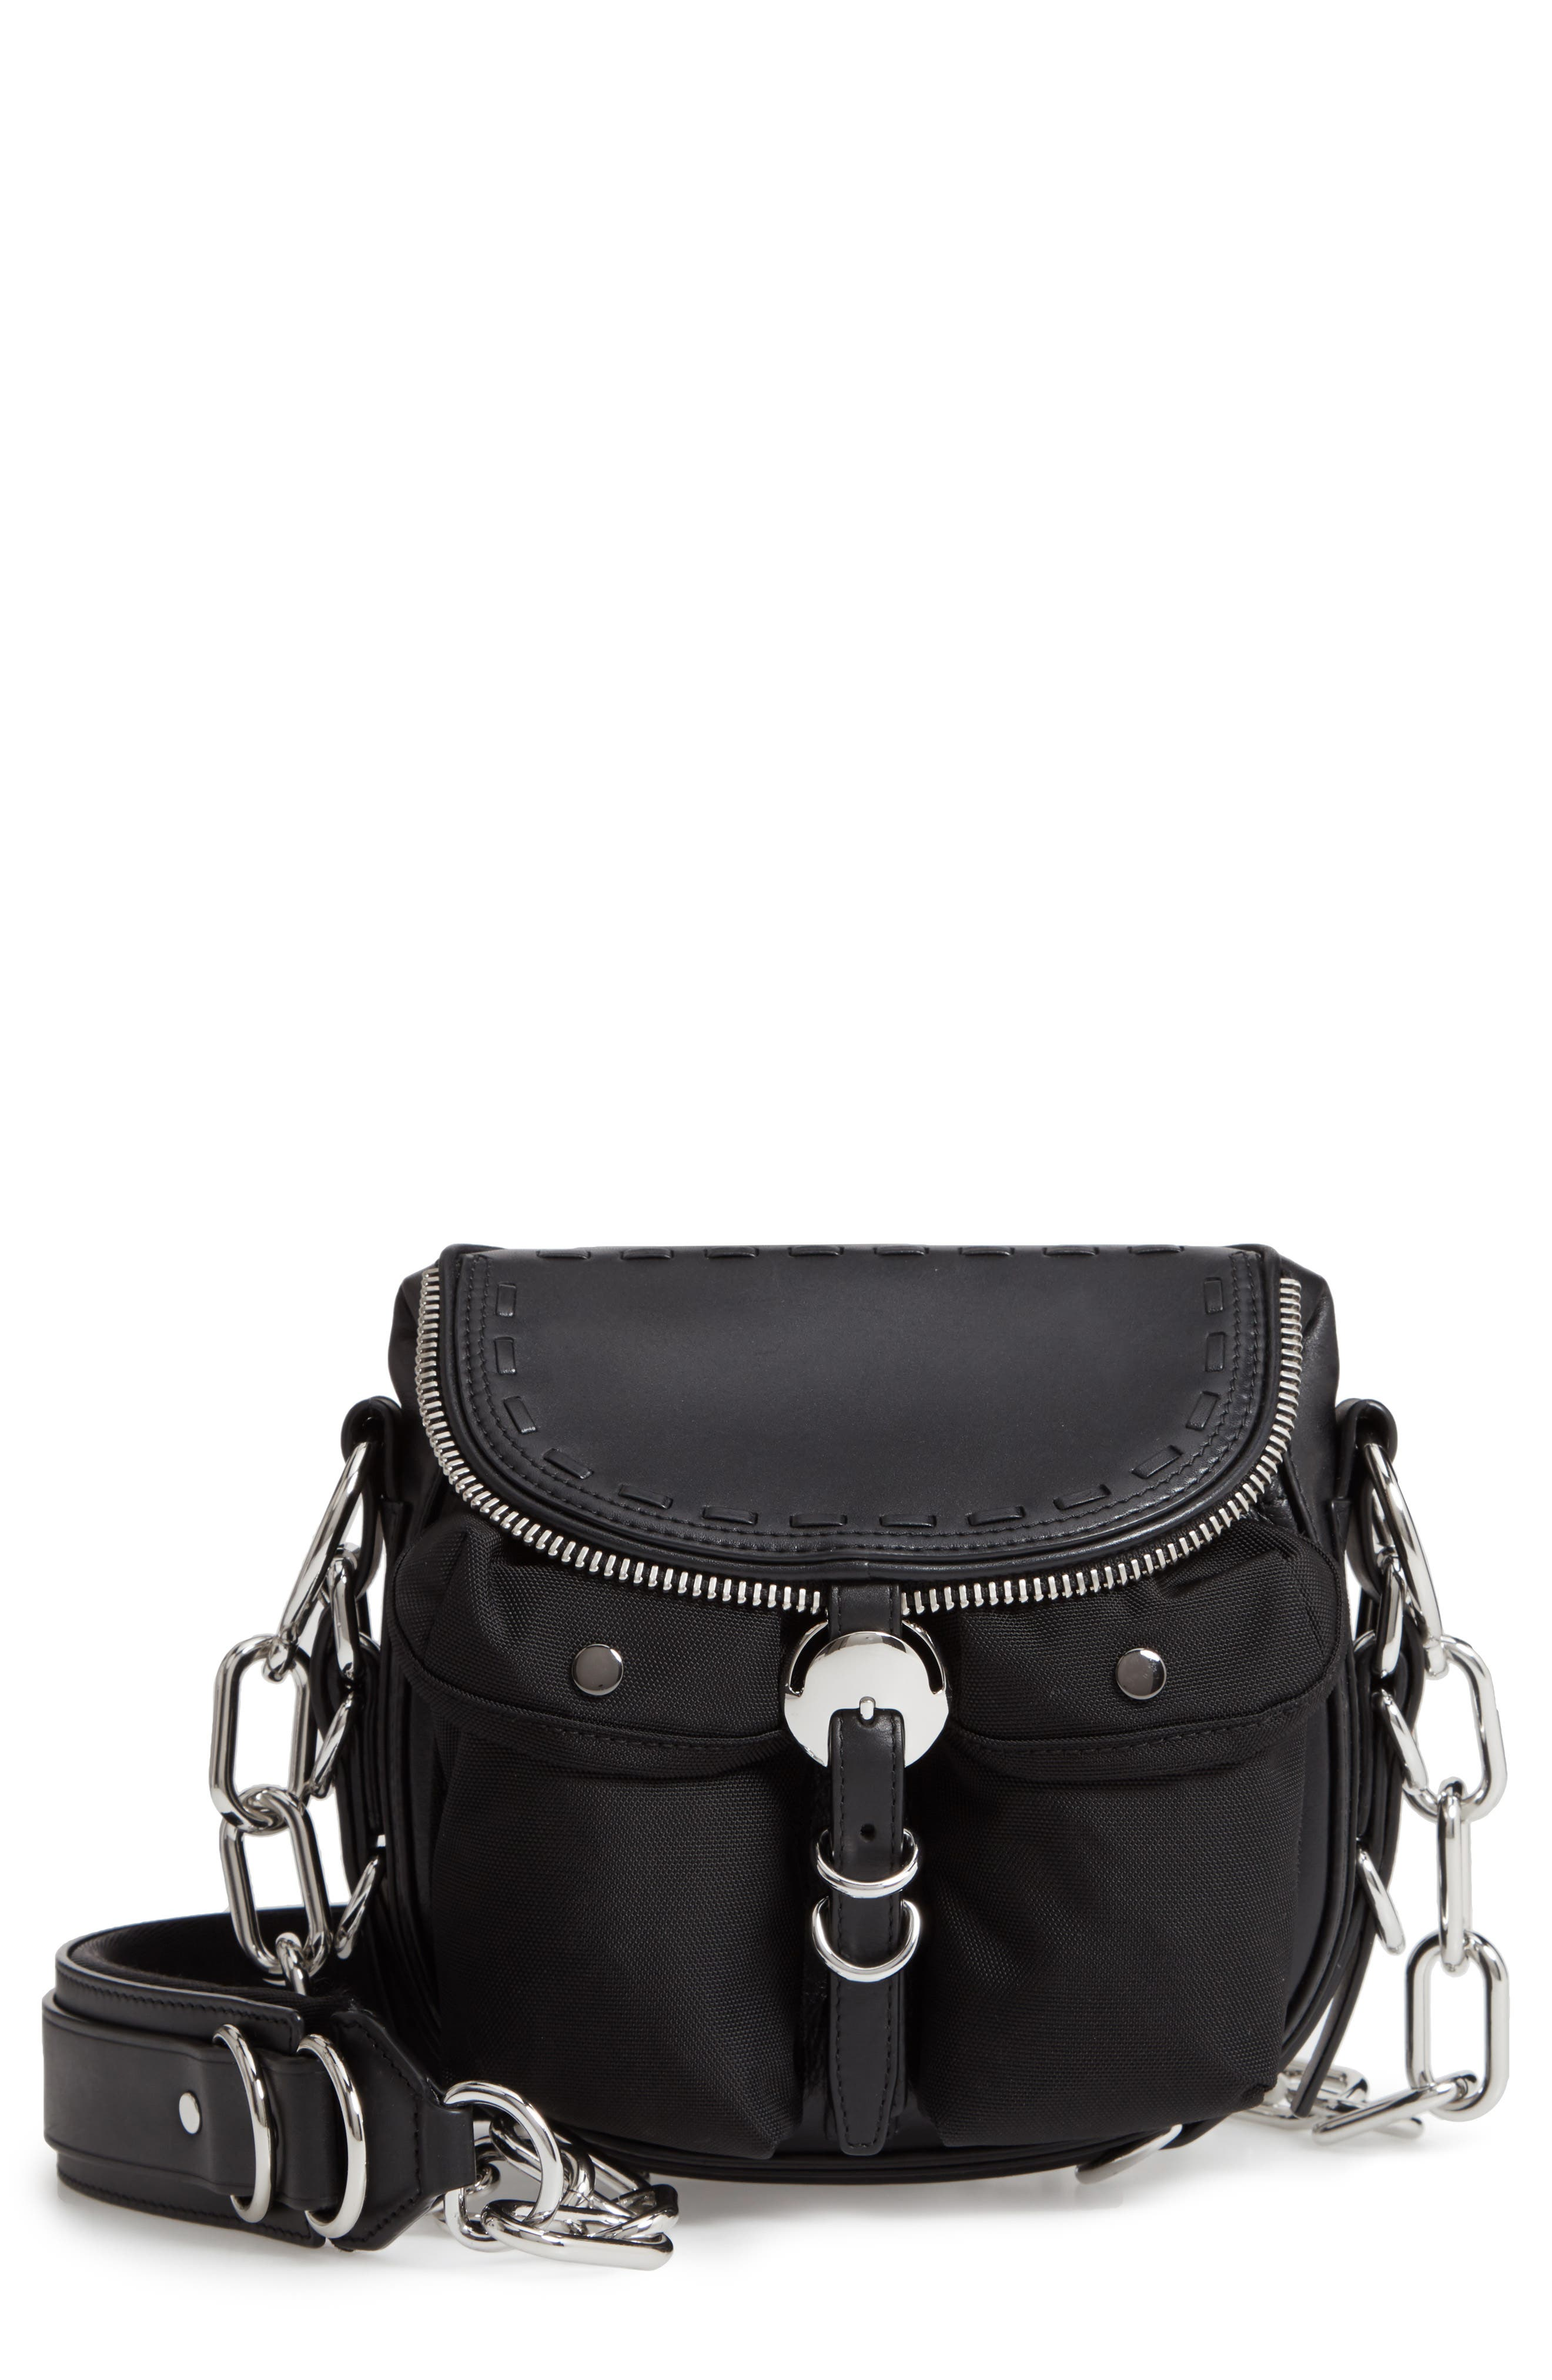 Rove Mixed Media Crossbody Bag,                             Main thumbnail 1, color,                             BLACK